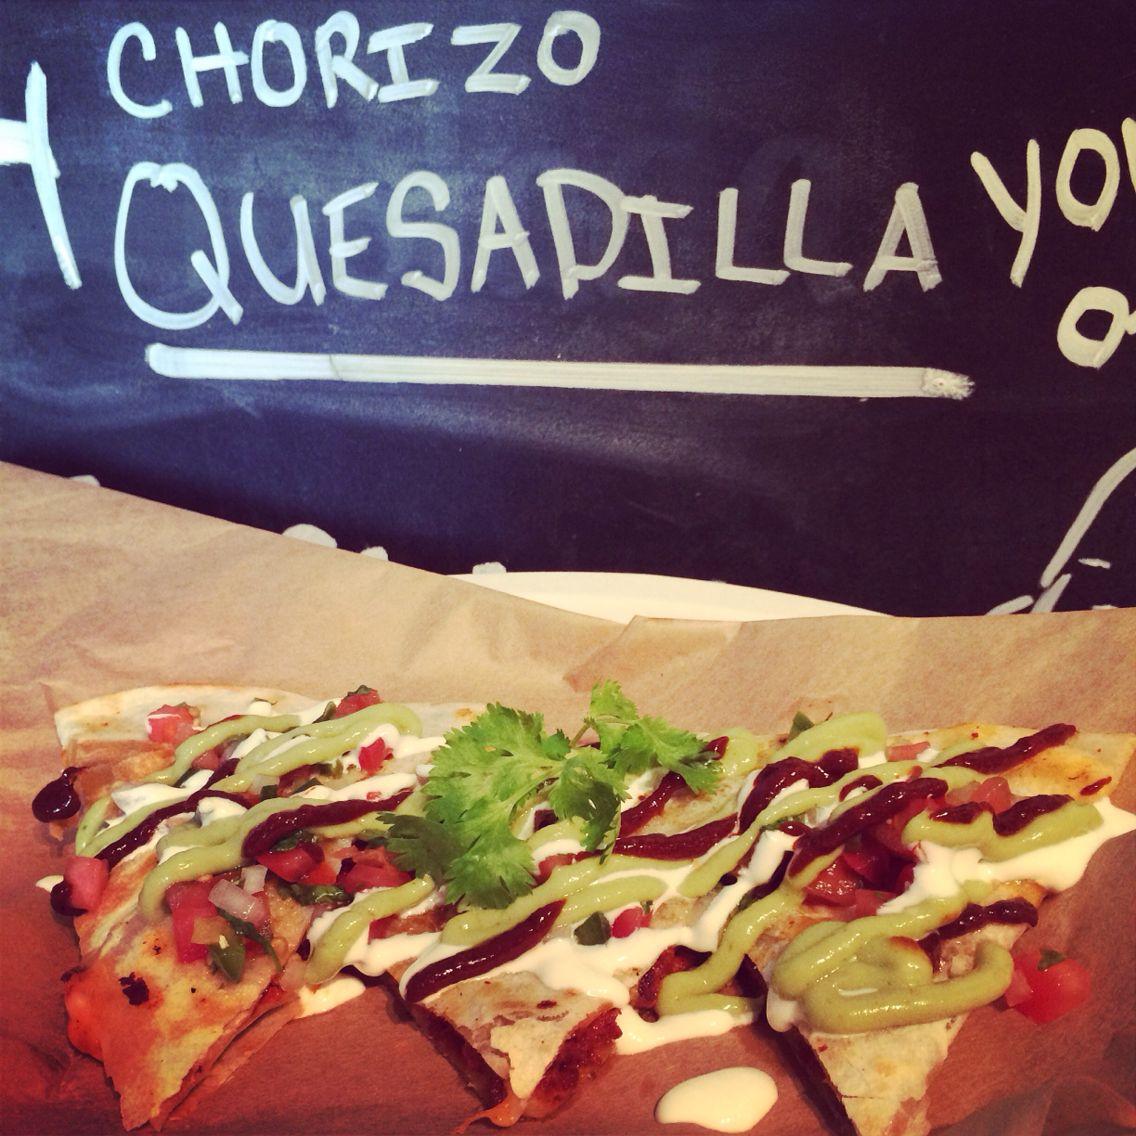 Chorizo Quesadilla by @PolosCarreta